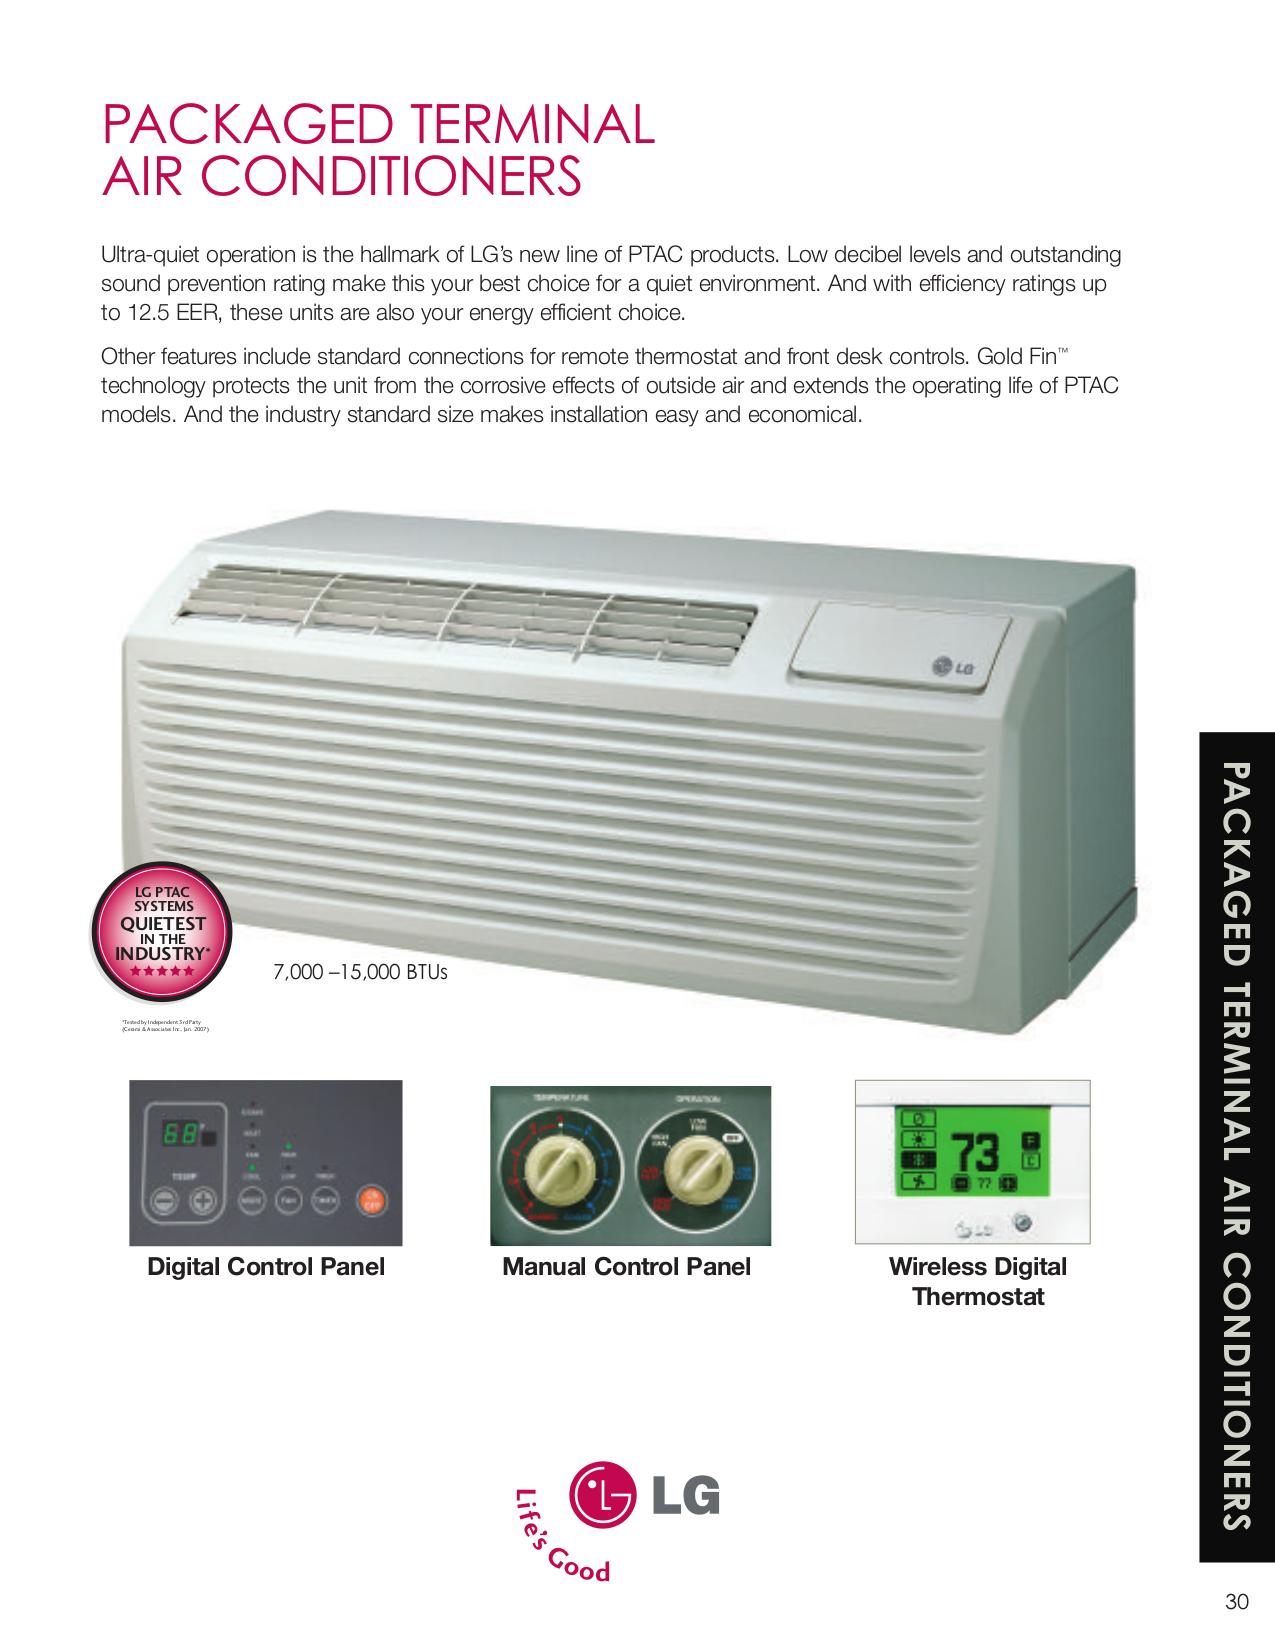 pdf manual for lg air conditioner lp120ced1 lg split room air conditioner user manual lg gold air conditioner user manual